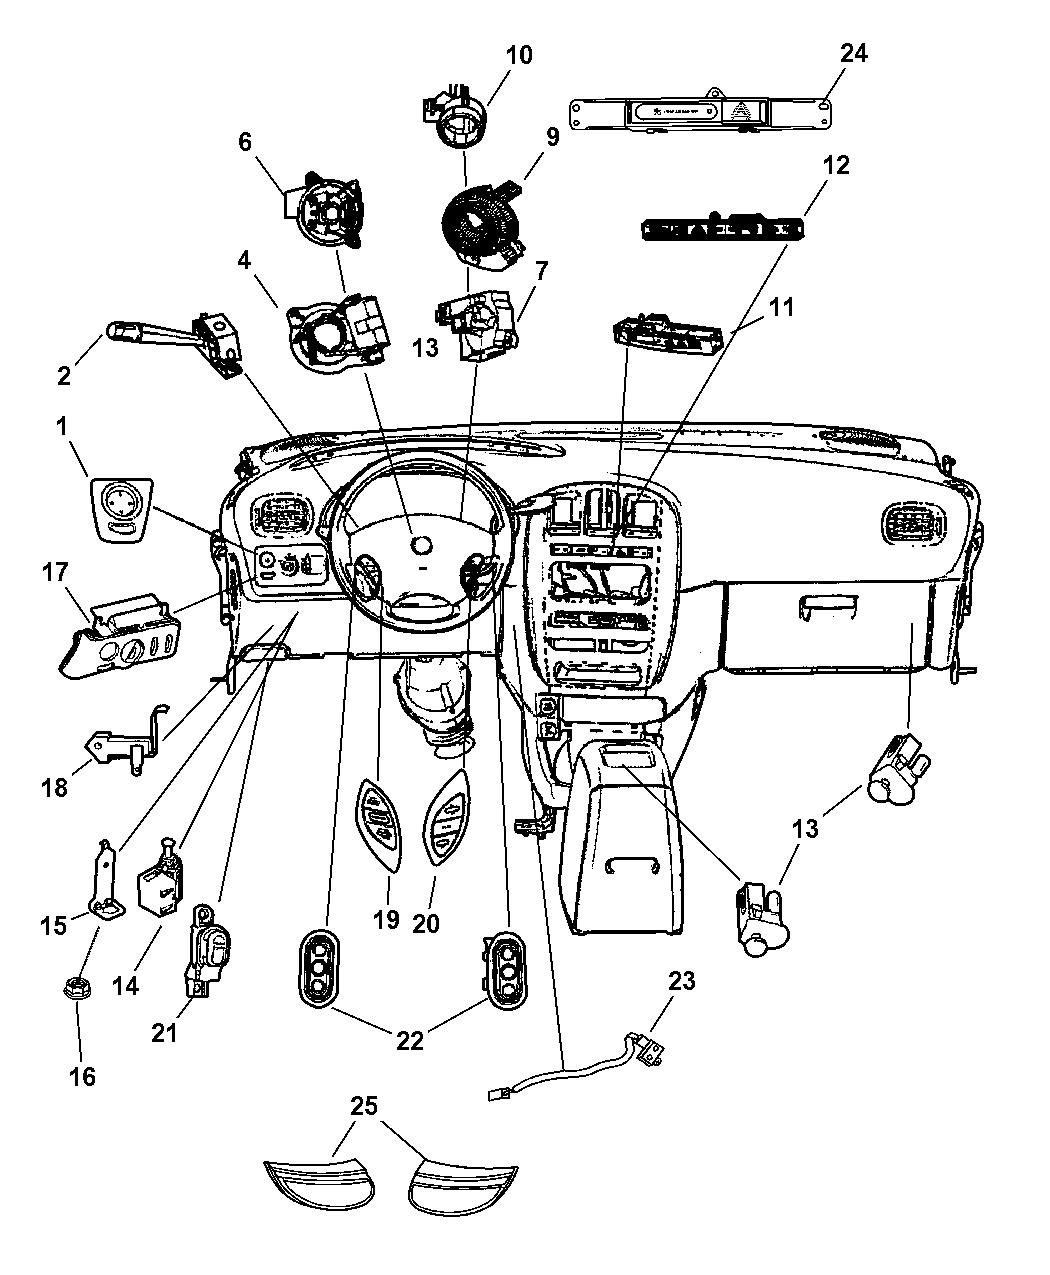 Dodge Grand Caravan Switches